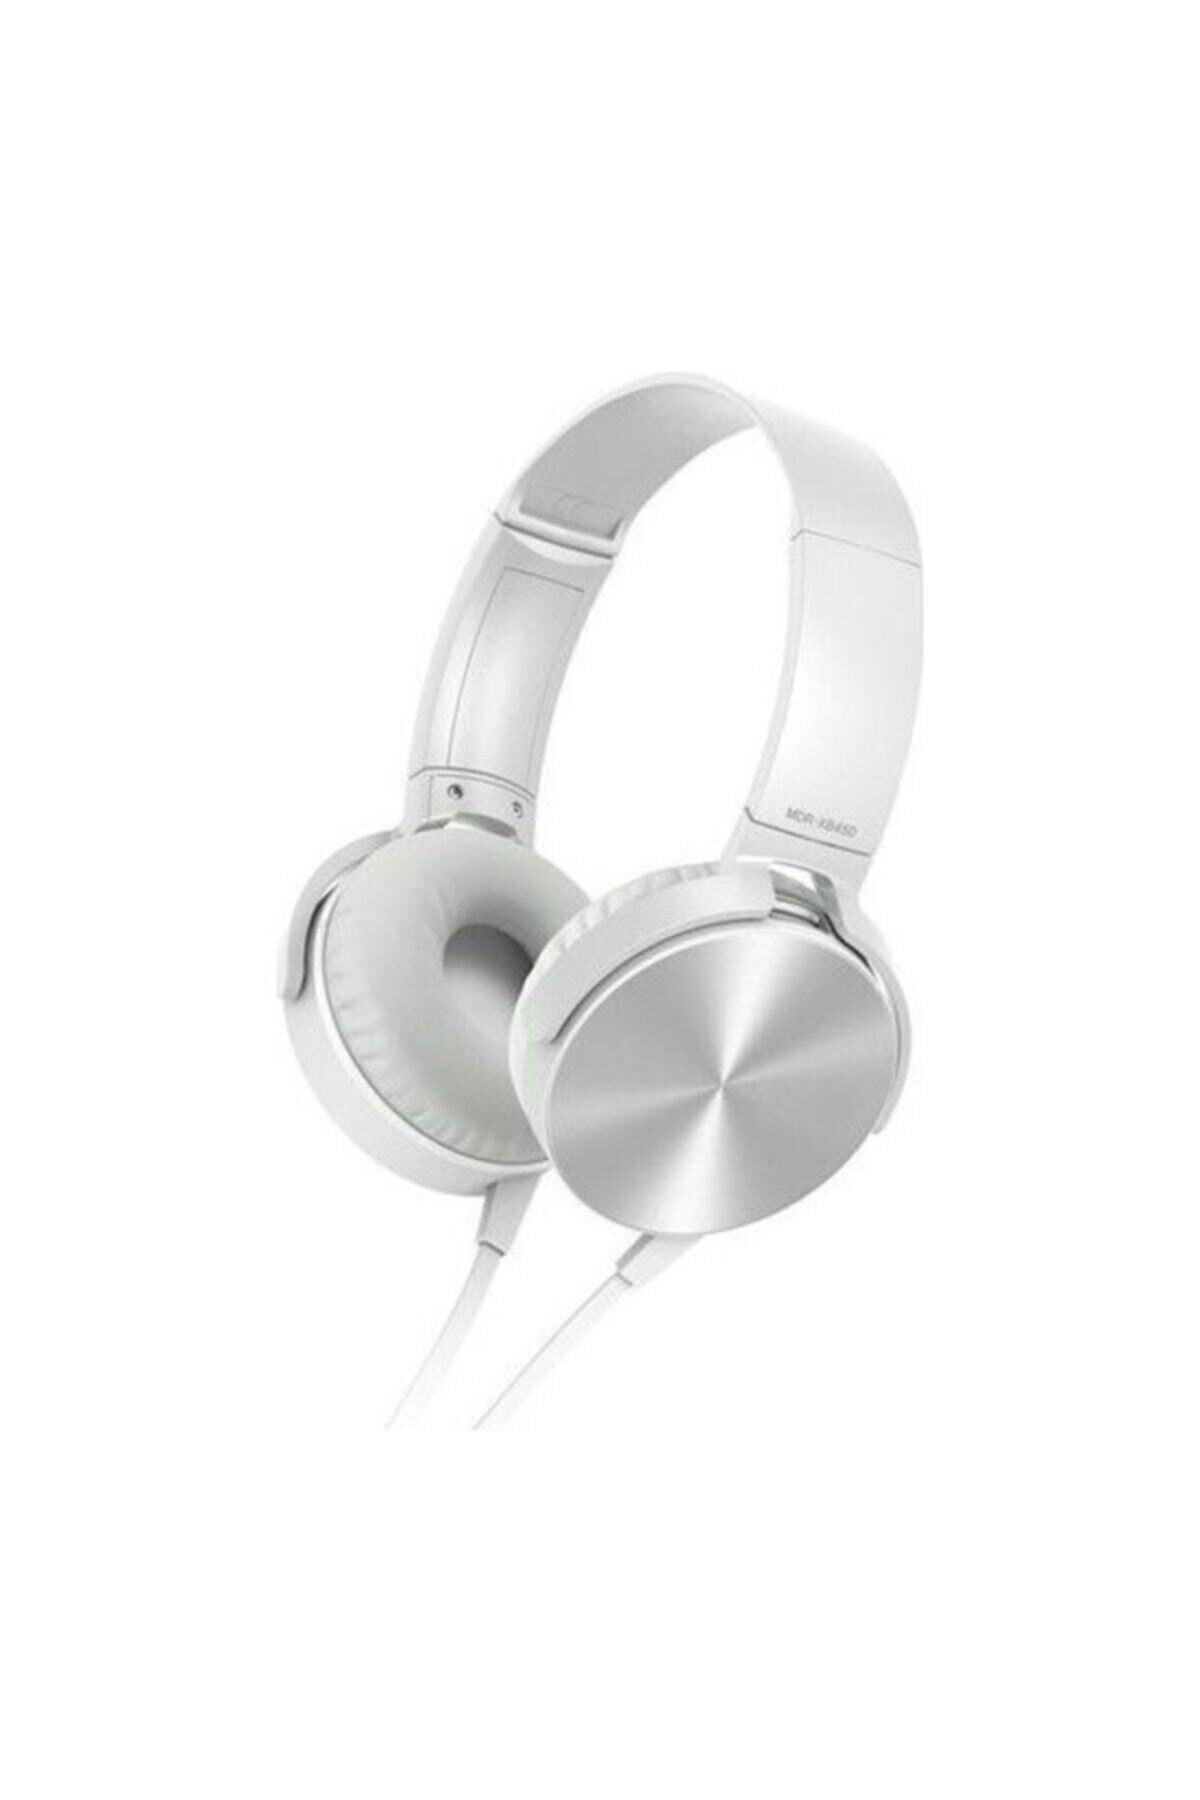 OKMORE Kafa Üstü Telefon Oyun Kulaklığı Extra Bass Stereo Beyaz 1